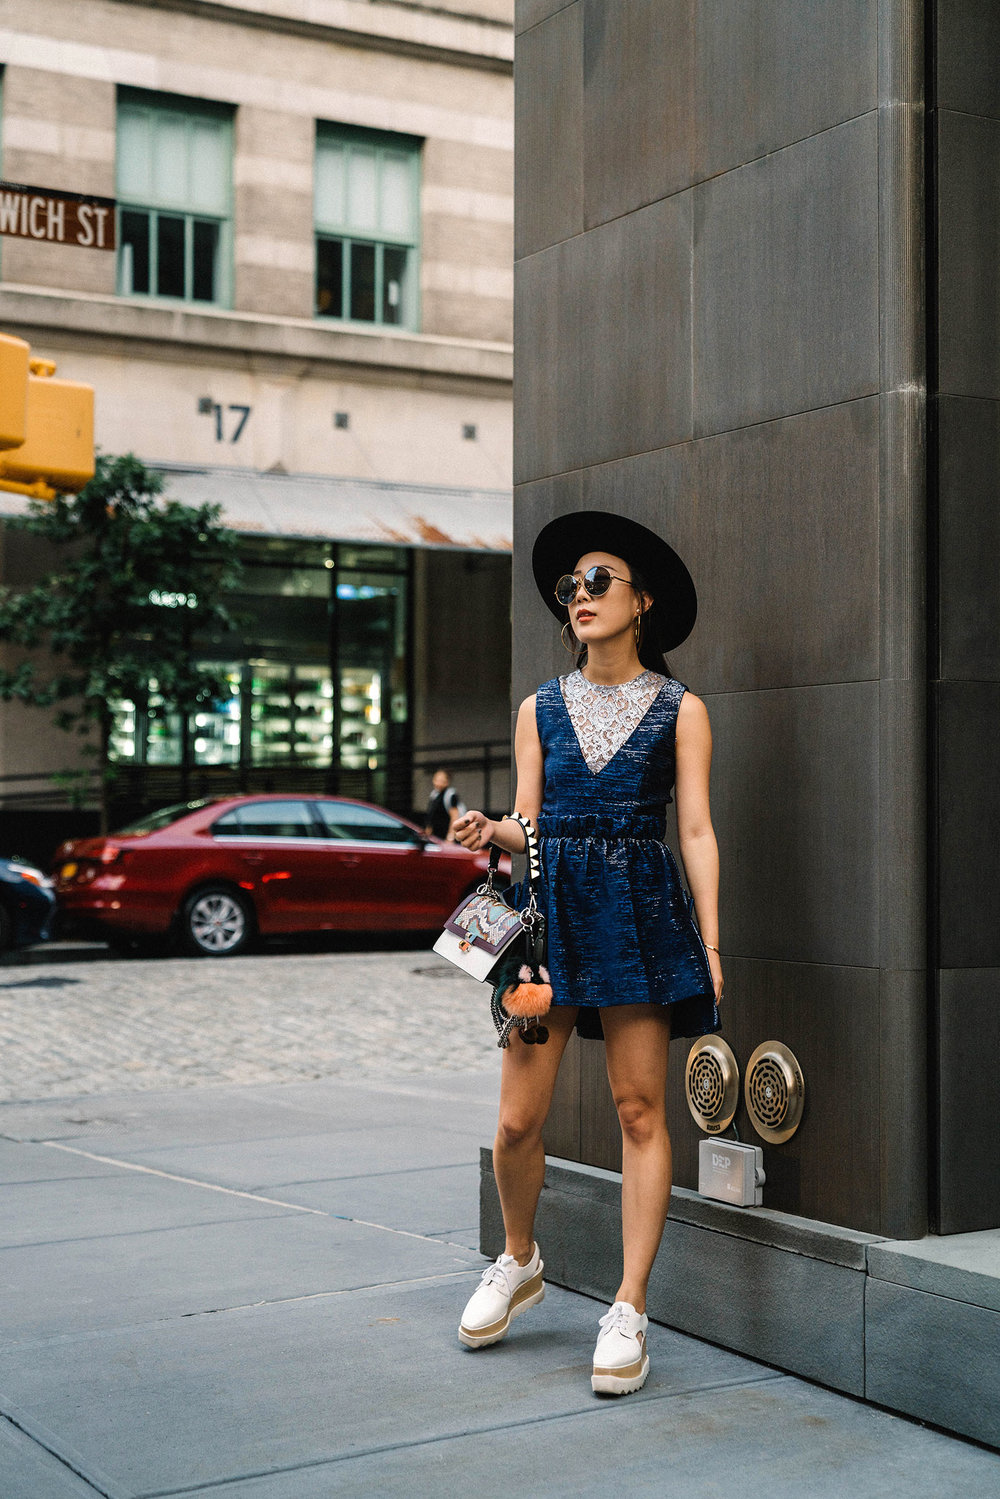 Jourden Dress, Stella McCartney Shoes (Similar), Fendi Bag and KeychainAltuzarra Sunglasses